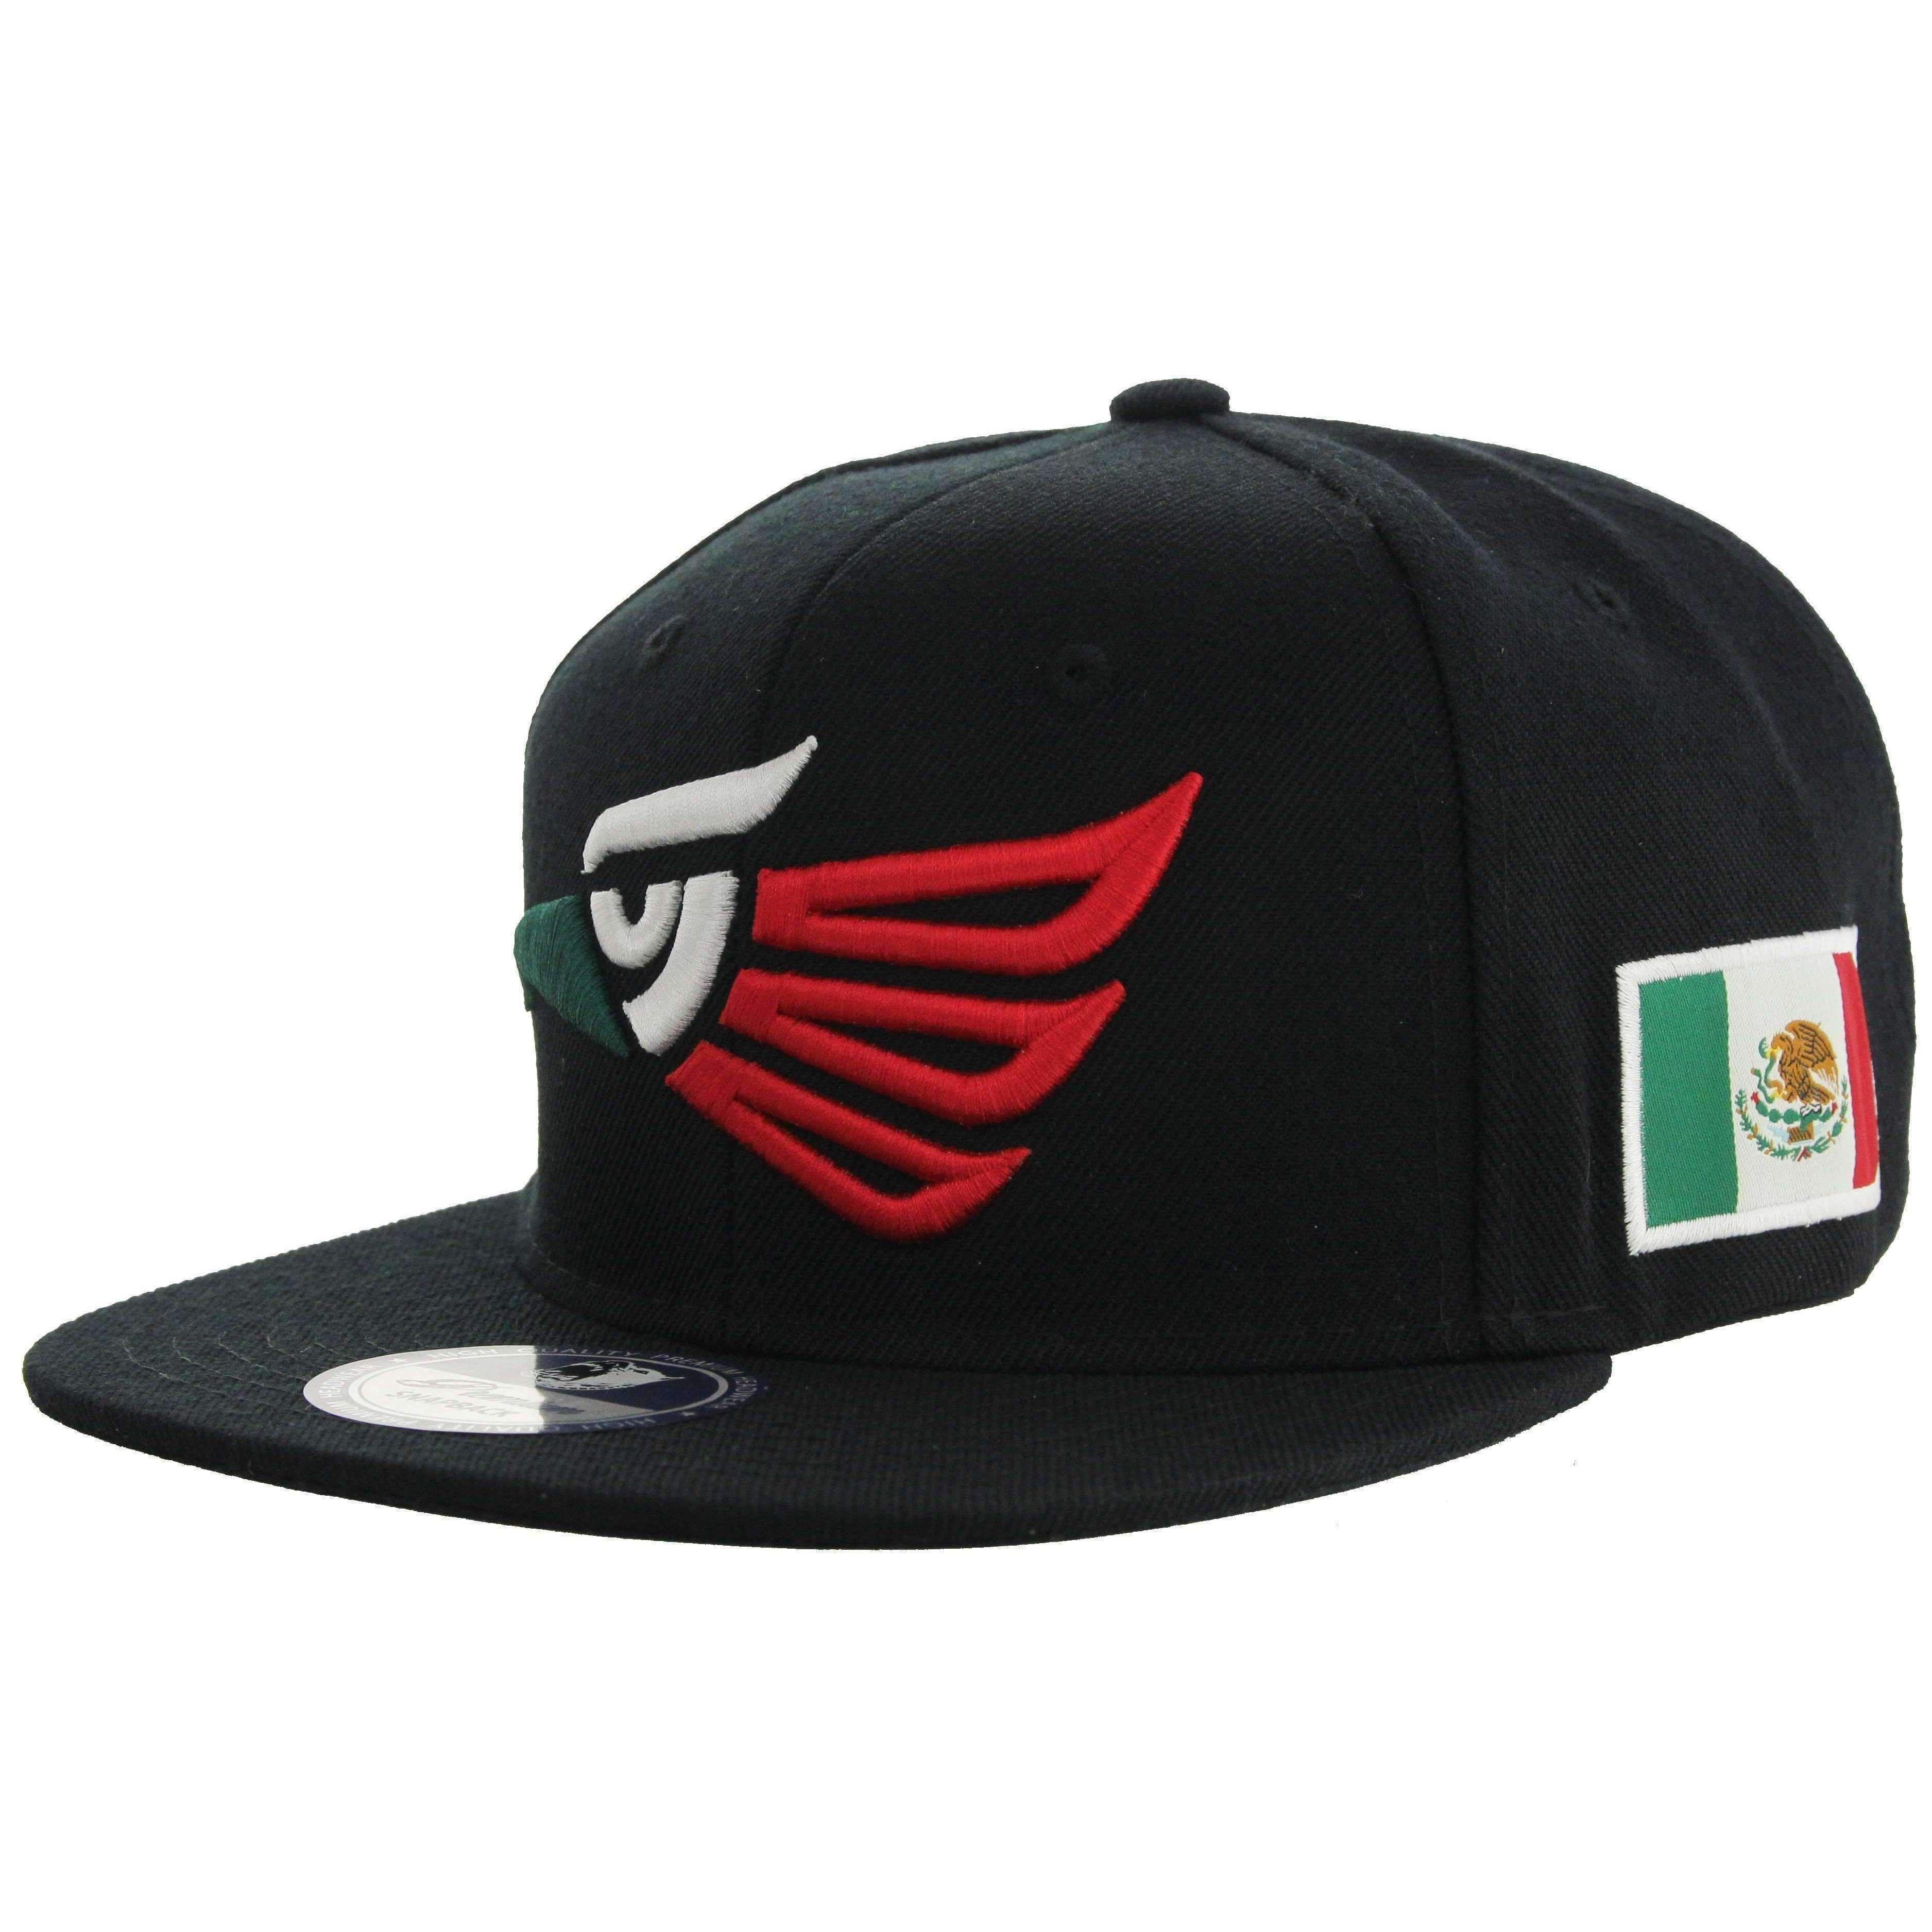 1a101fb7 Hecho En Mexico Eagle Fashion SnapBack   Products   Snapback, Mexico ...